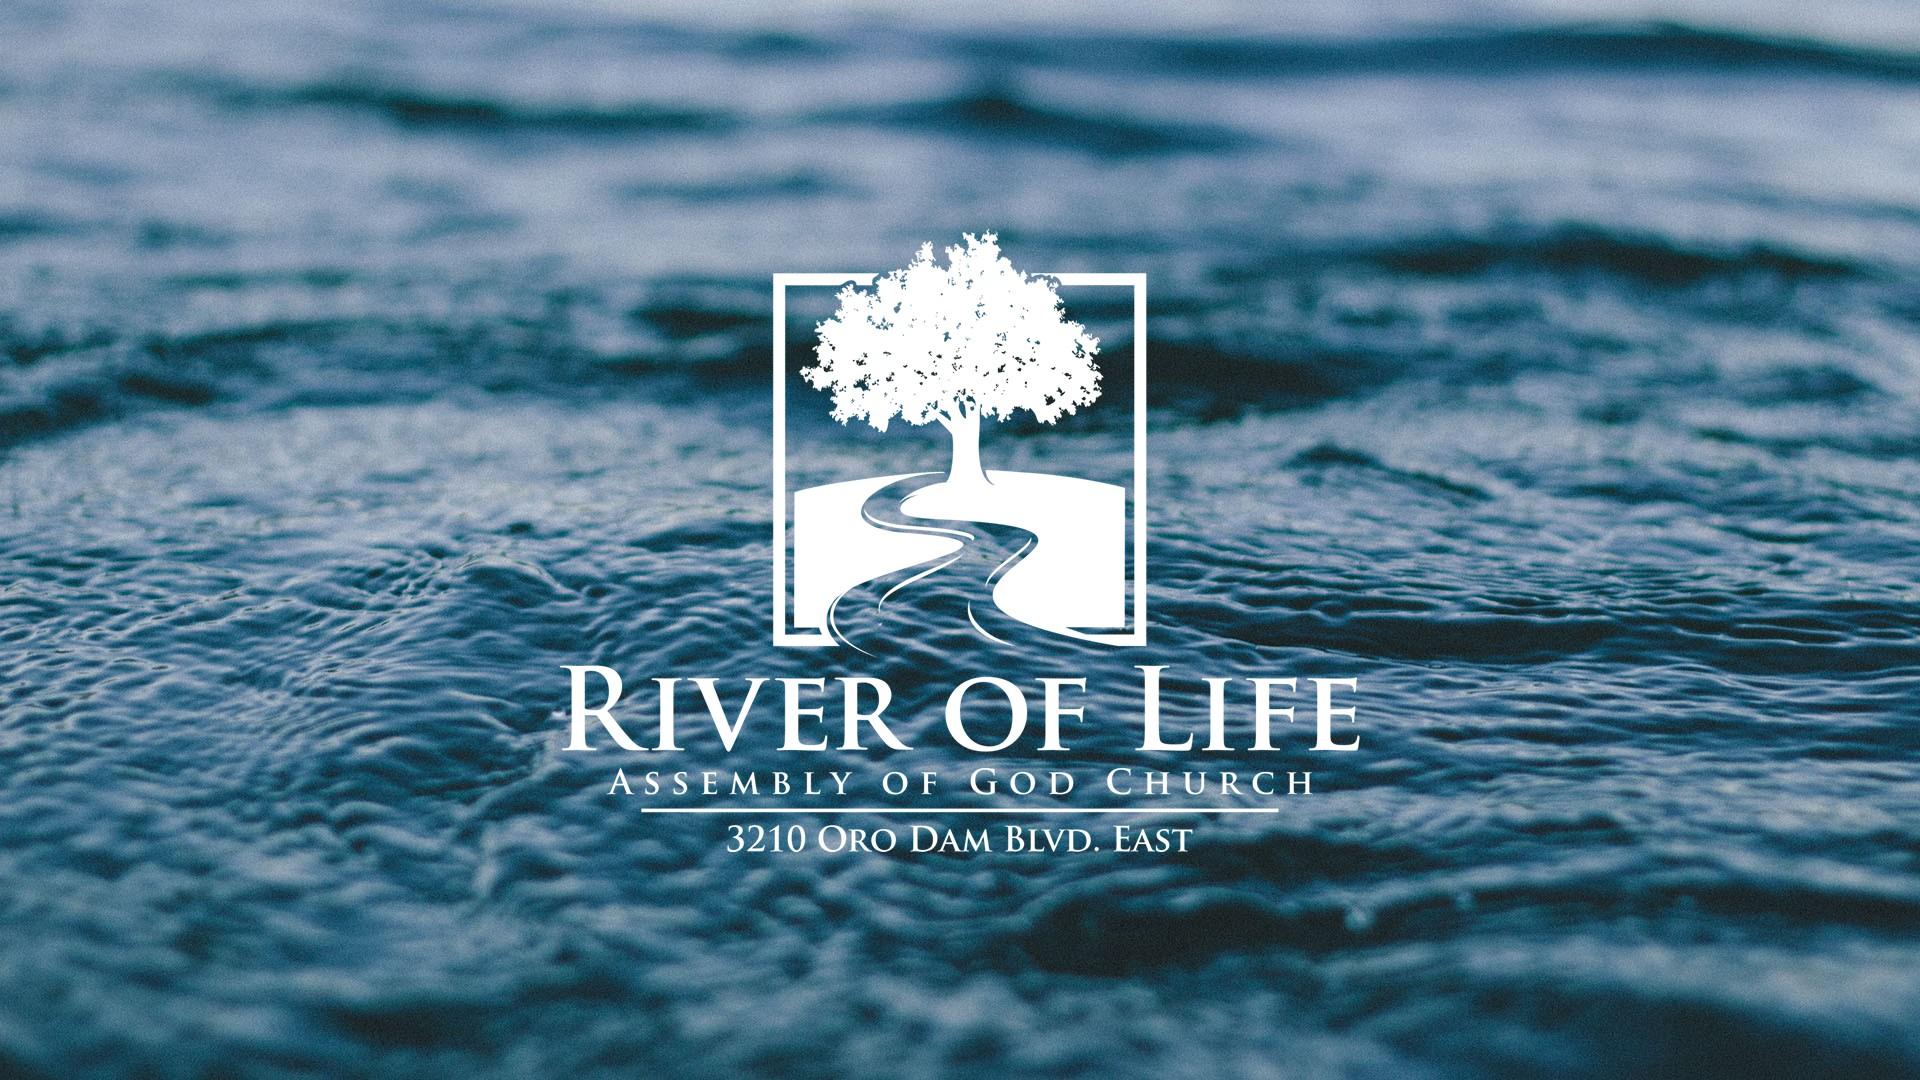 Design a brandable logo for River of Life Church.